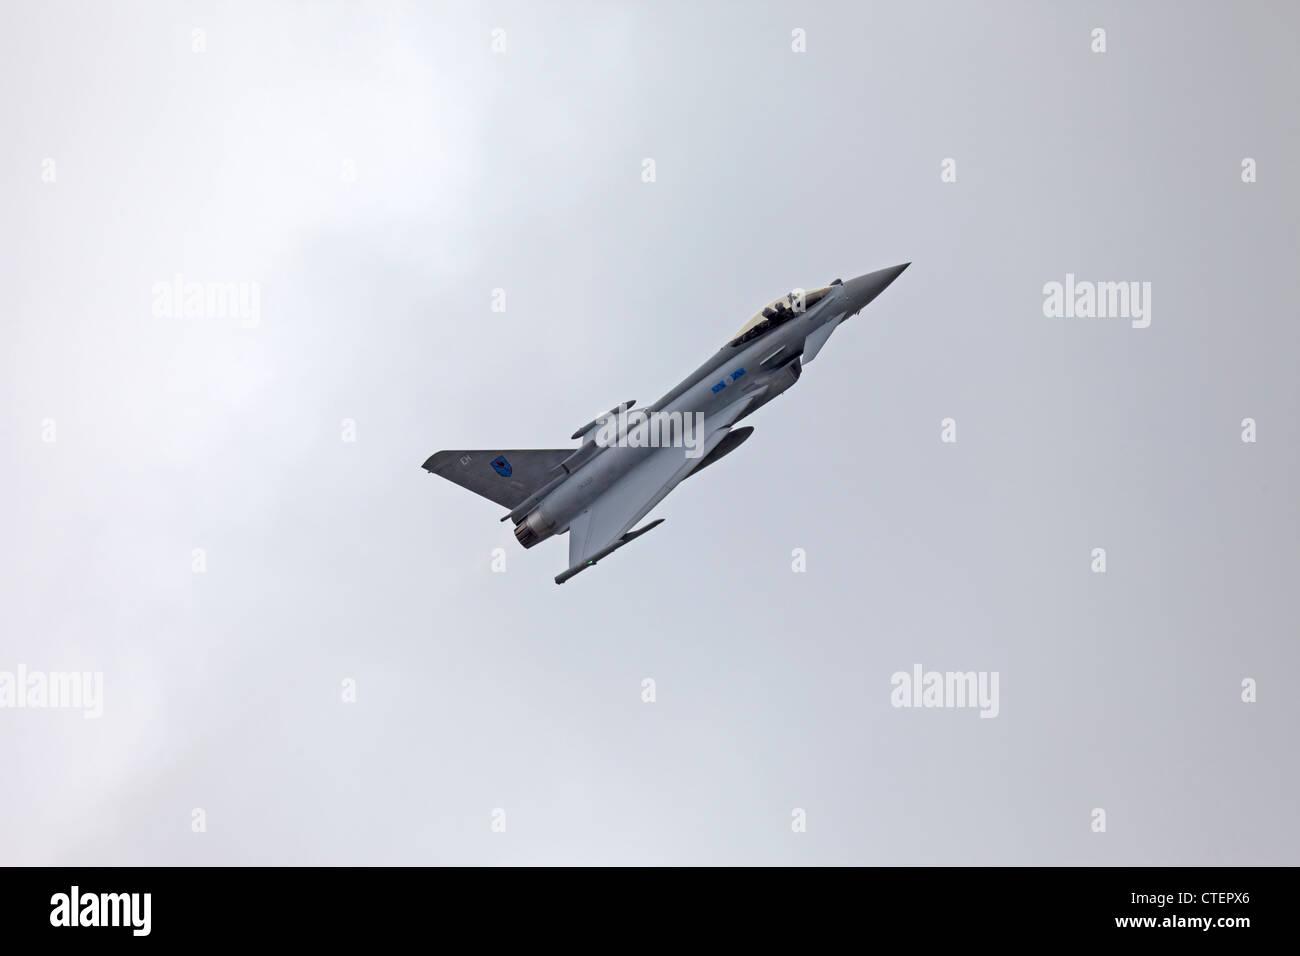 Farnborough International Airshow Eurofighter Typhoon - Stock Image